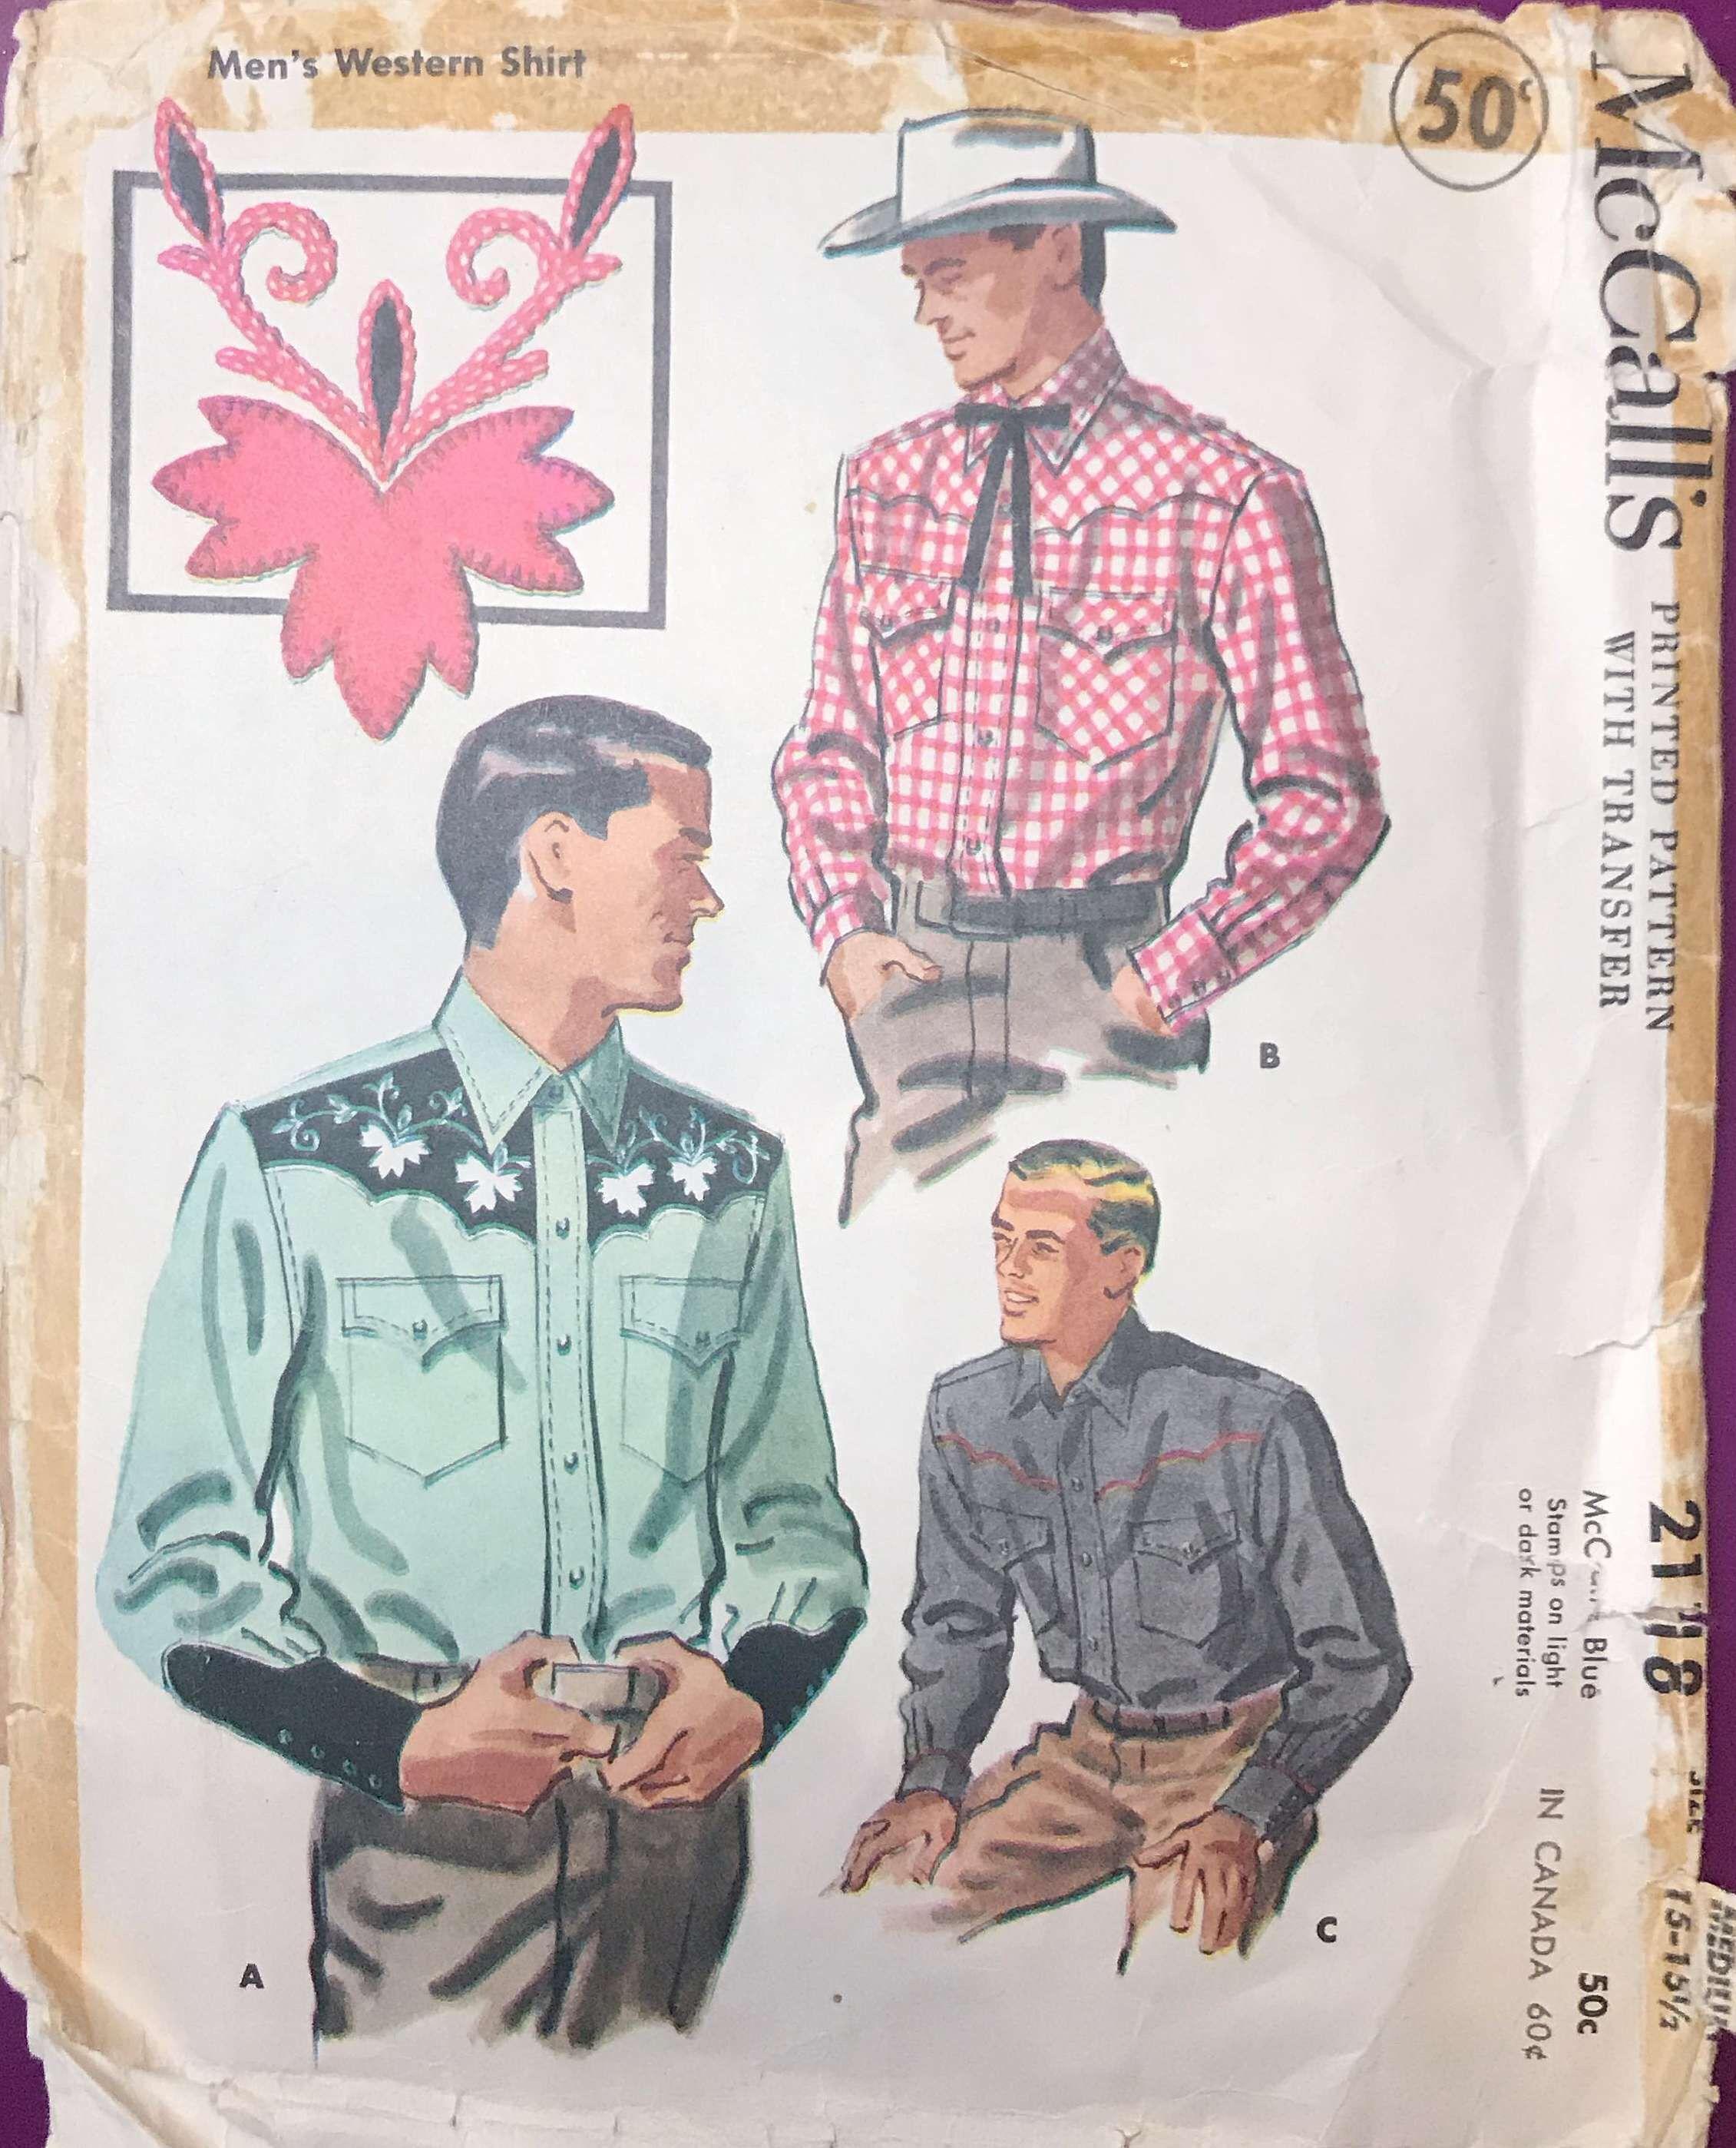 Sewing Western Menswear Using Vintage Patterns | Sewing